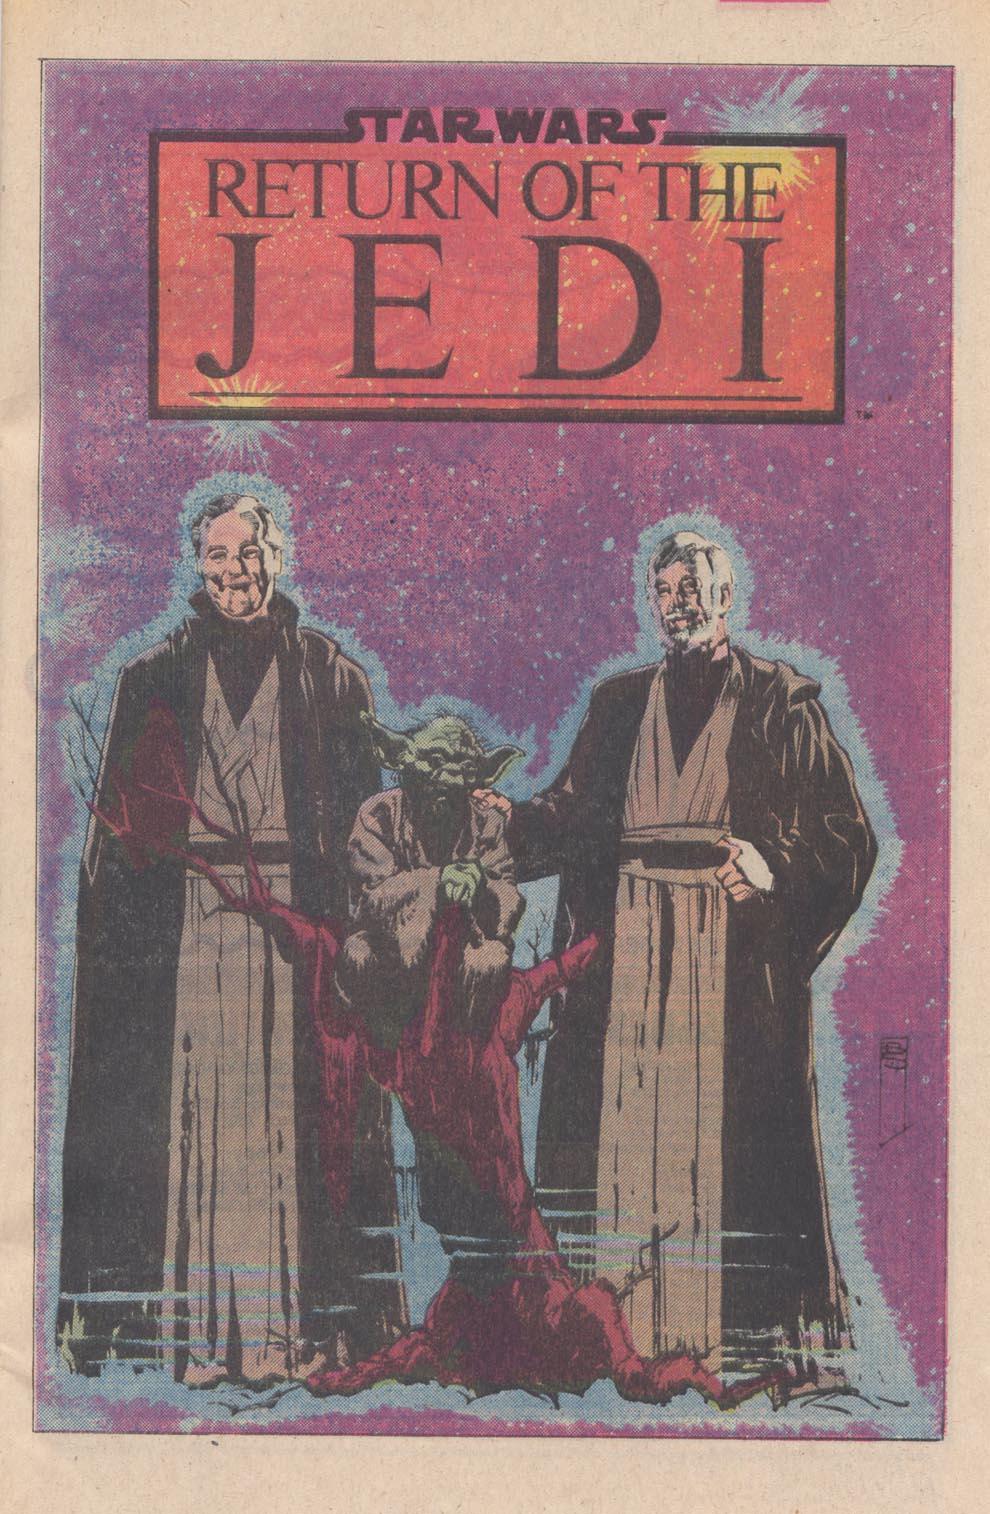 Read online Star Wars: Return of the Jedi comic -  Issue #4 - 25